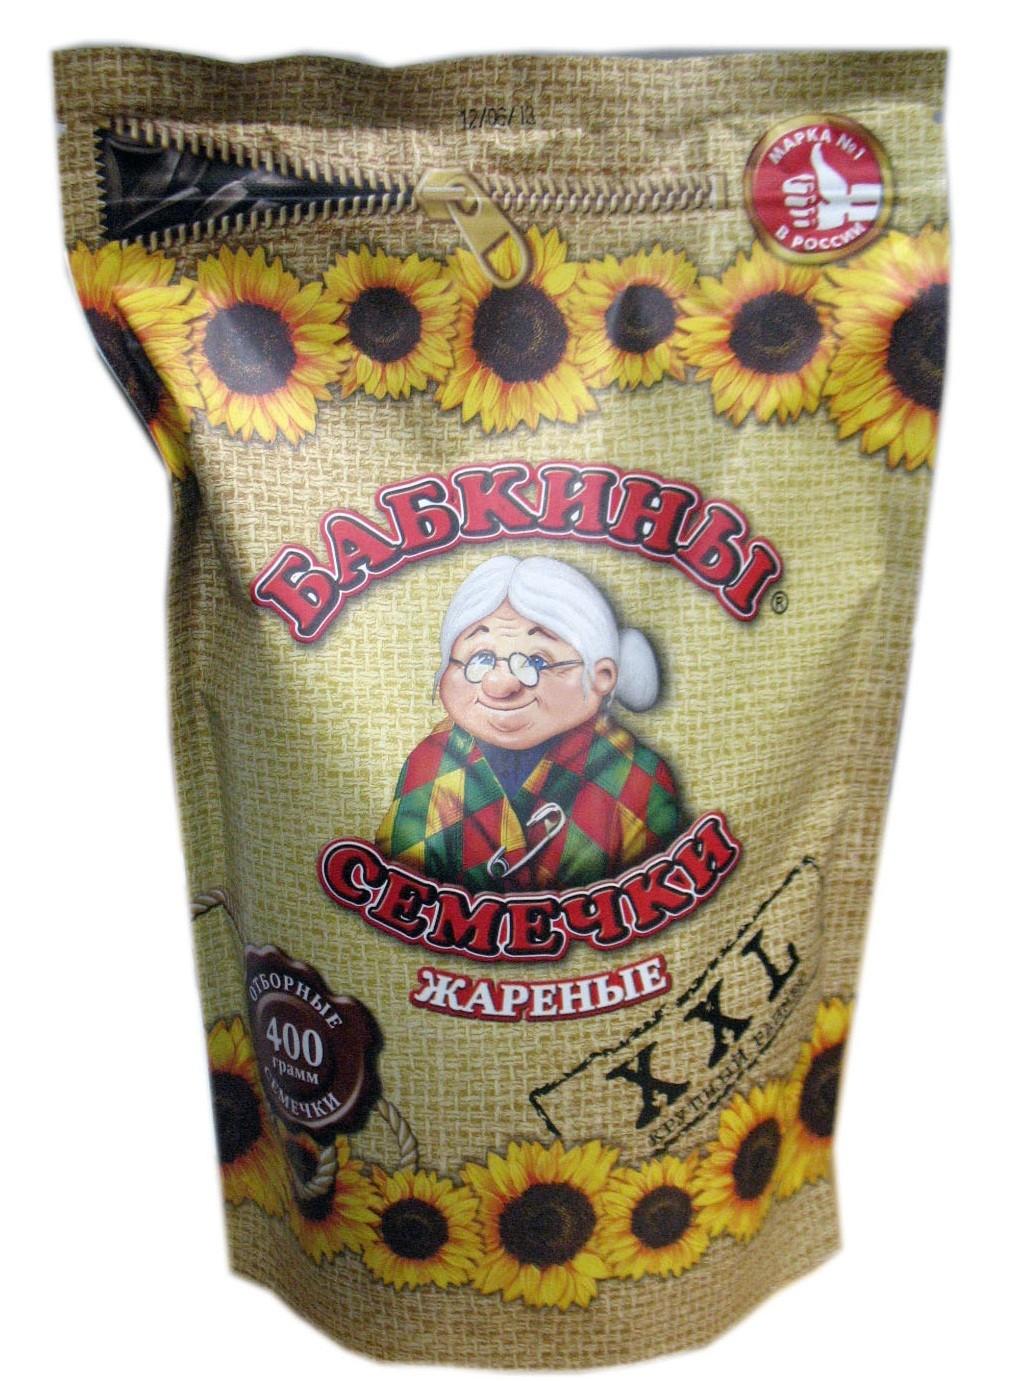 Sunflower Seeds Roasted  400g